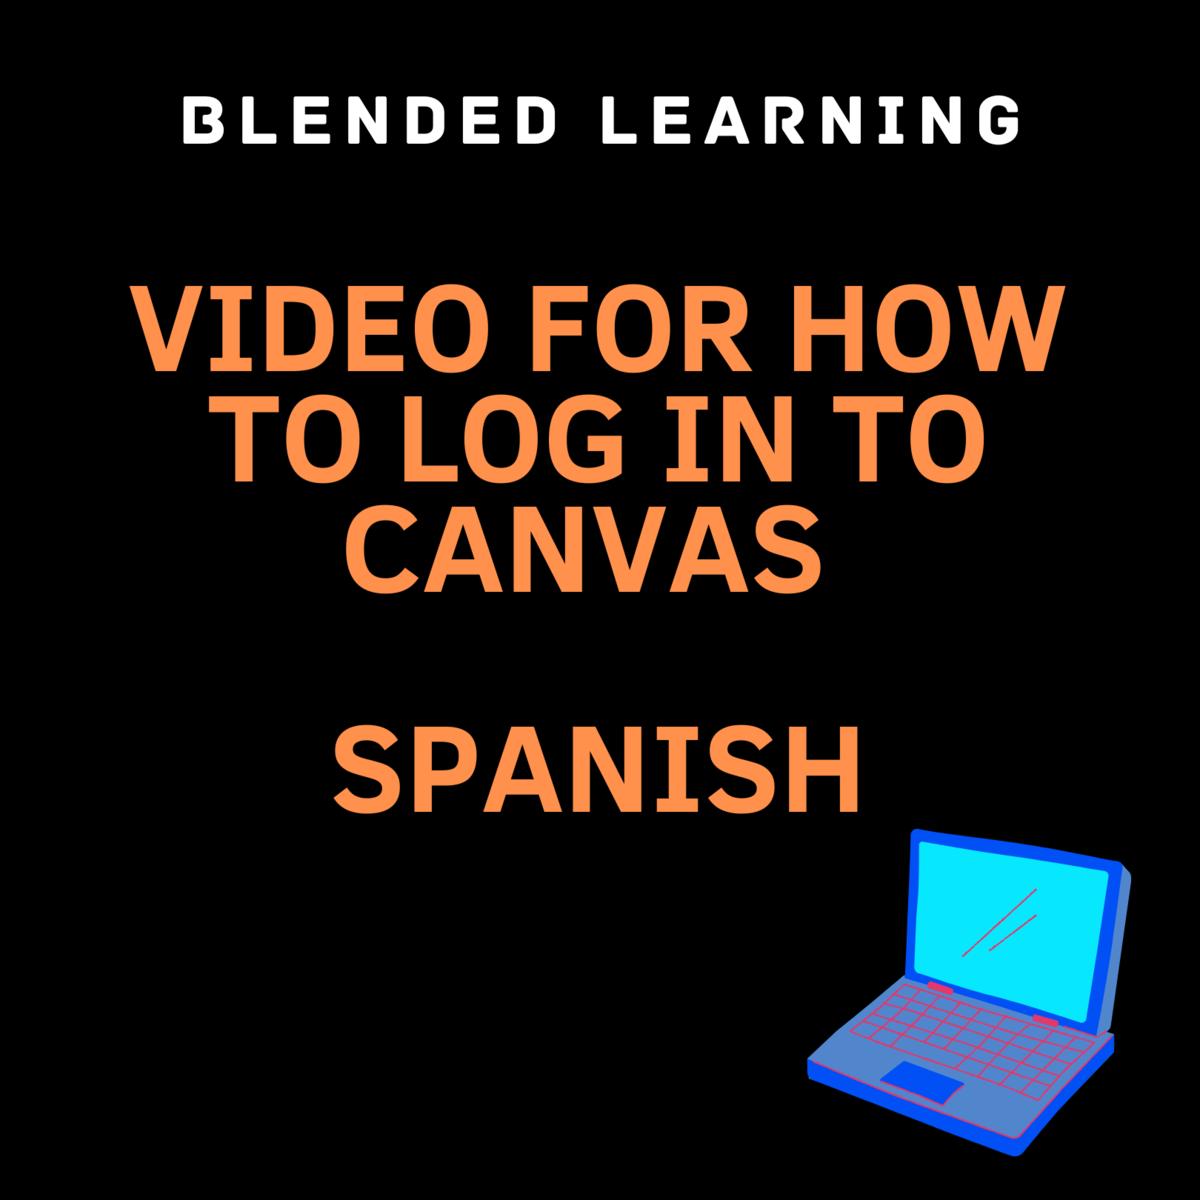 canvas log in spanish